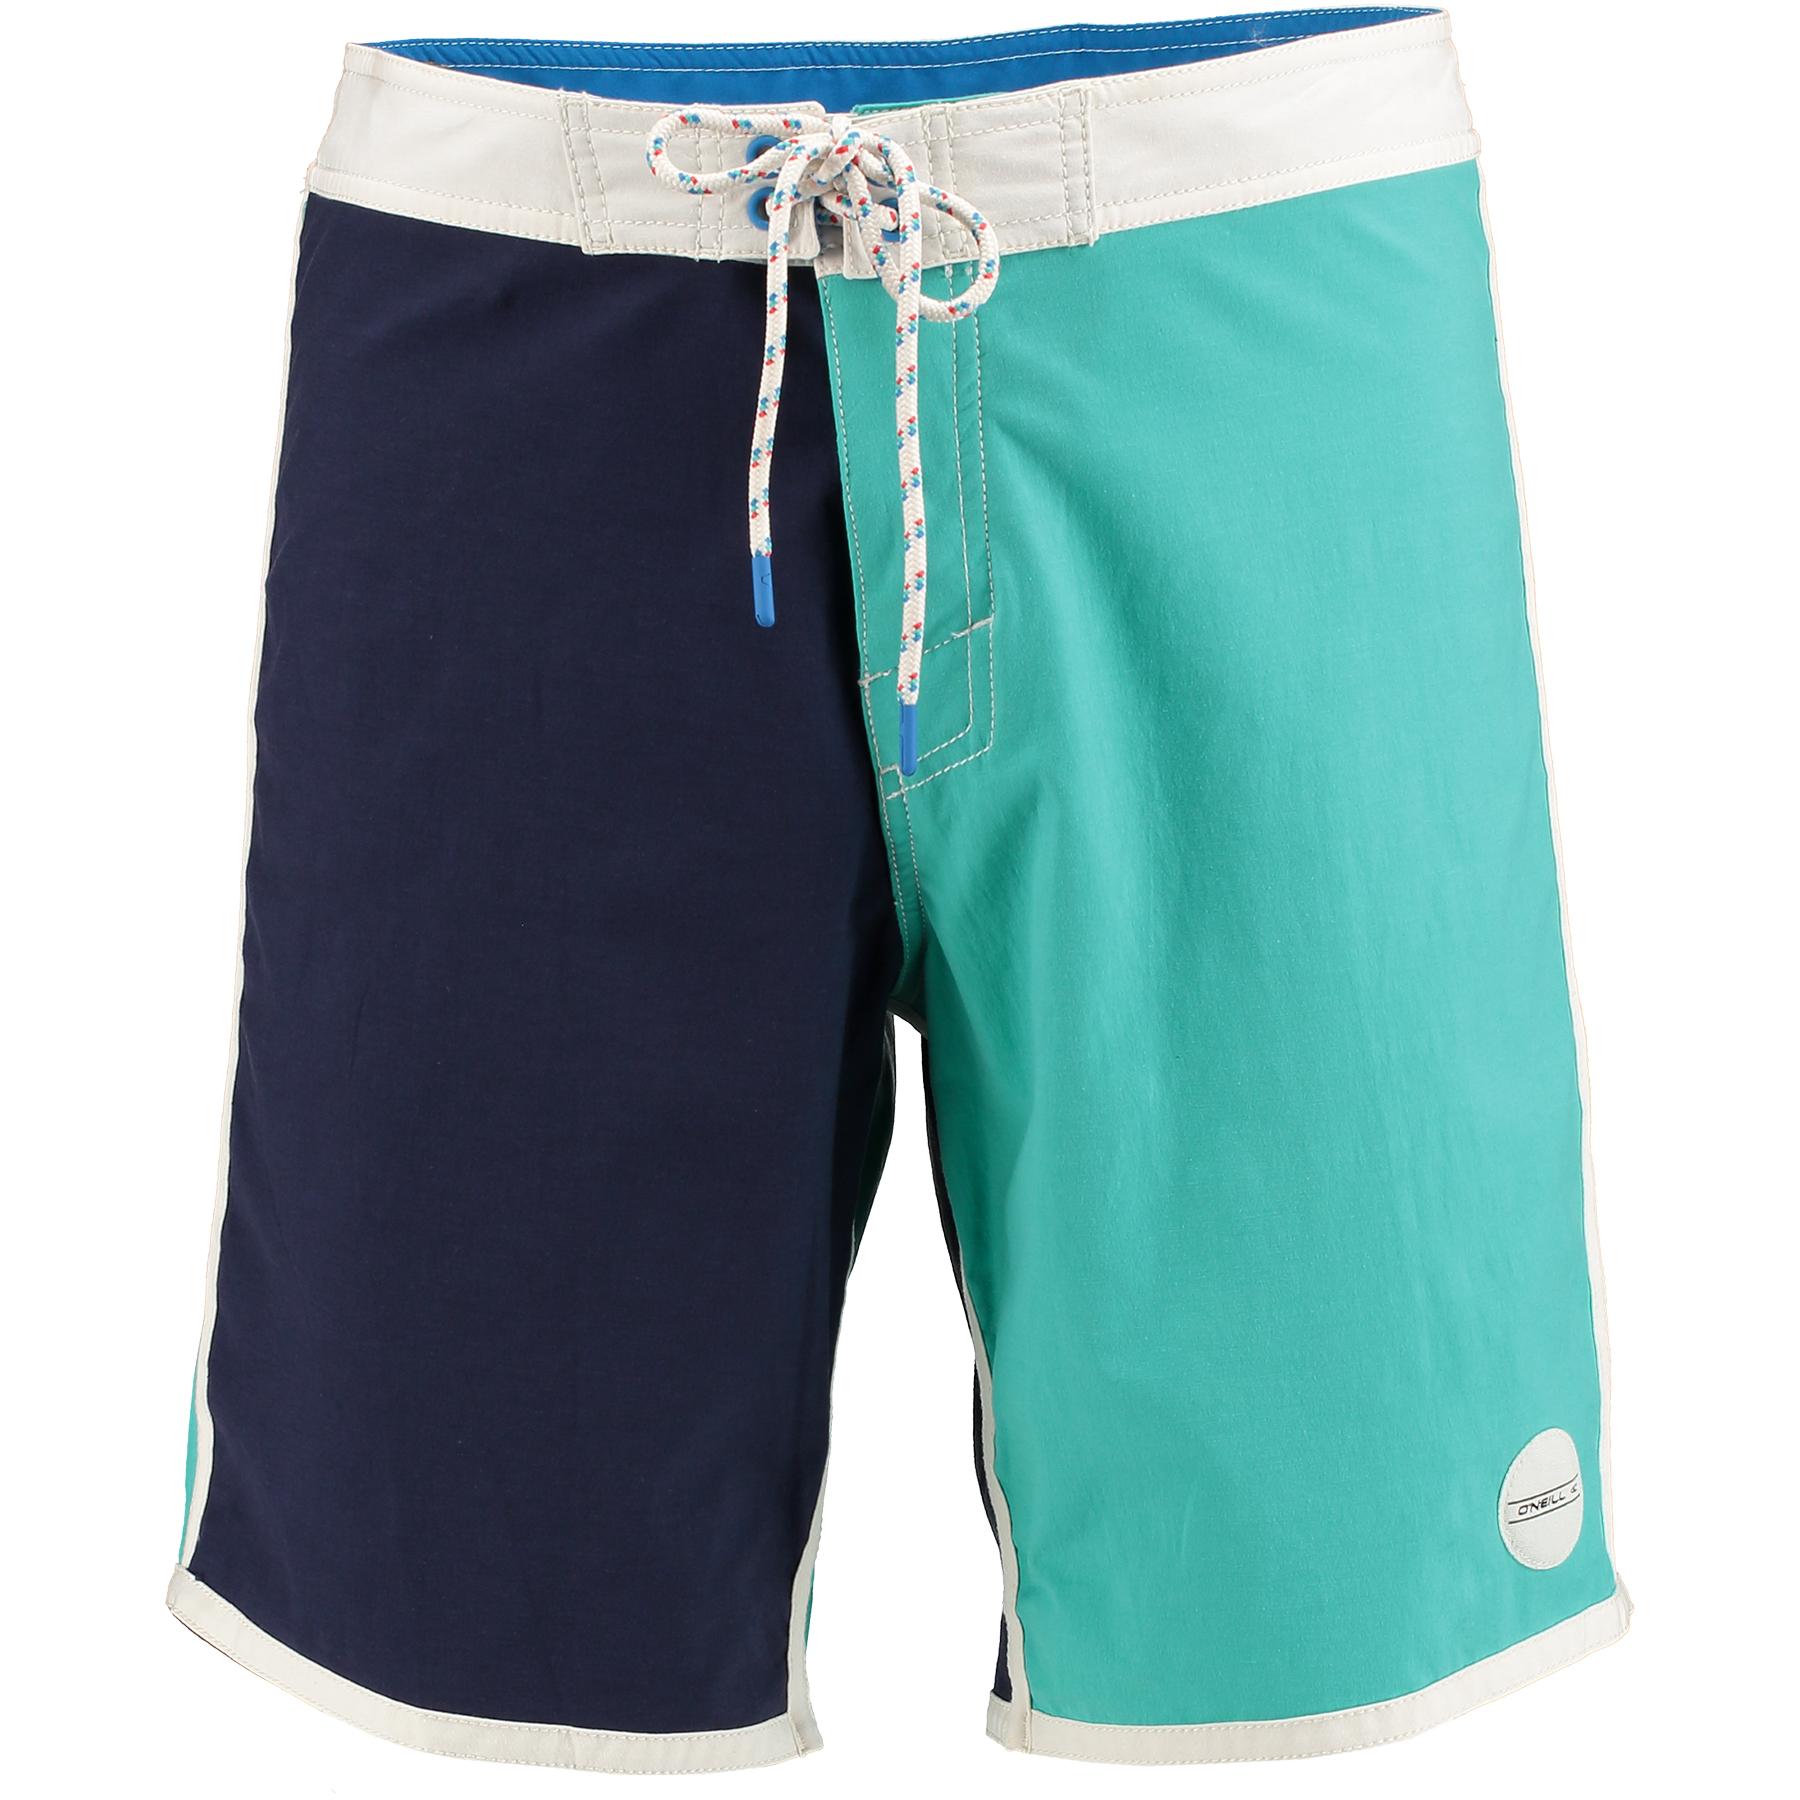 Boardshorts aus Eco-Textil.